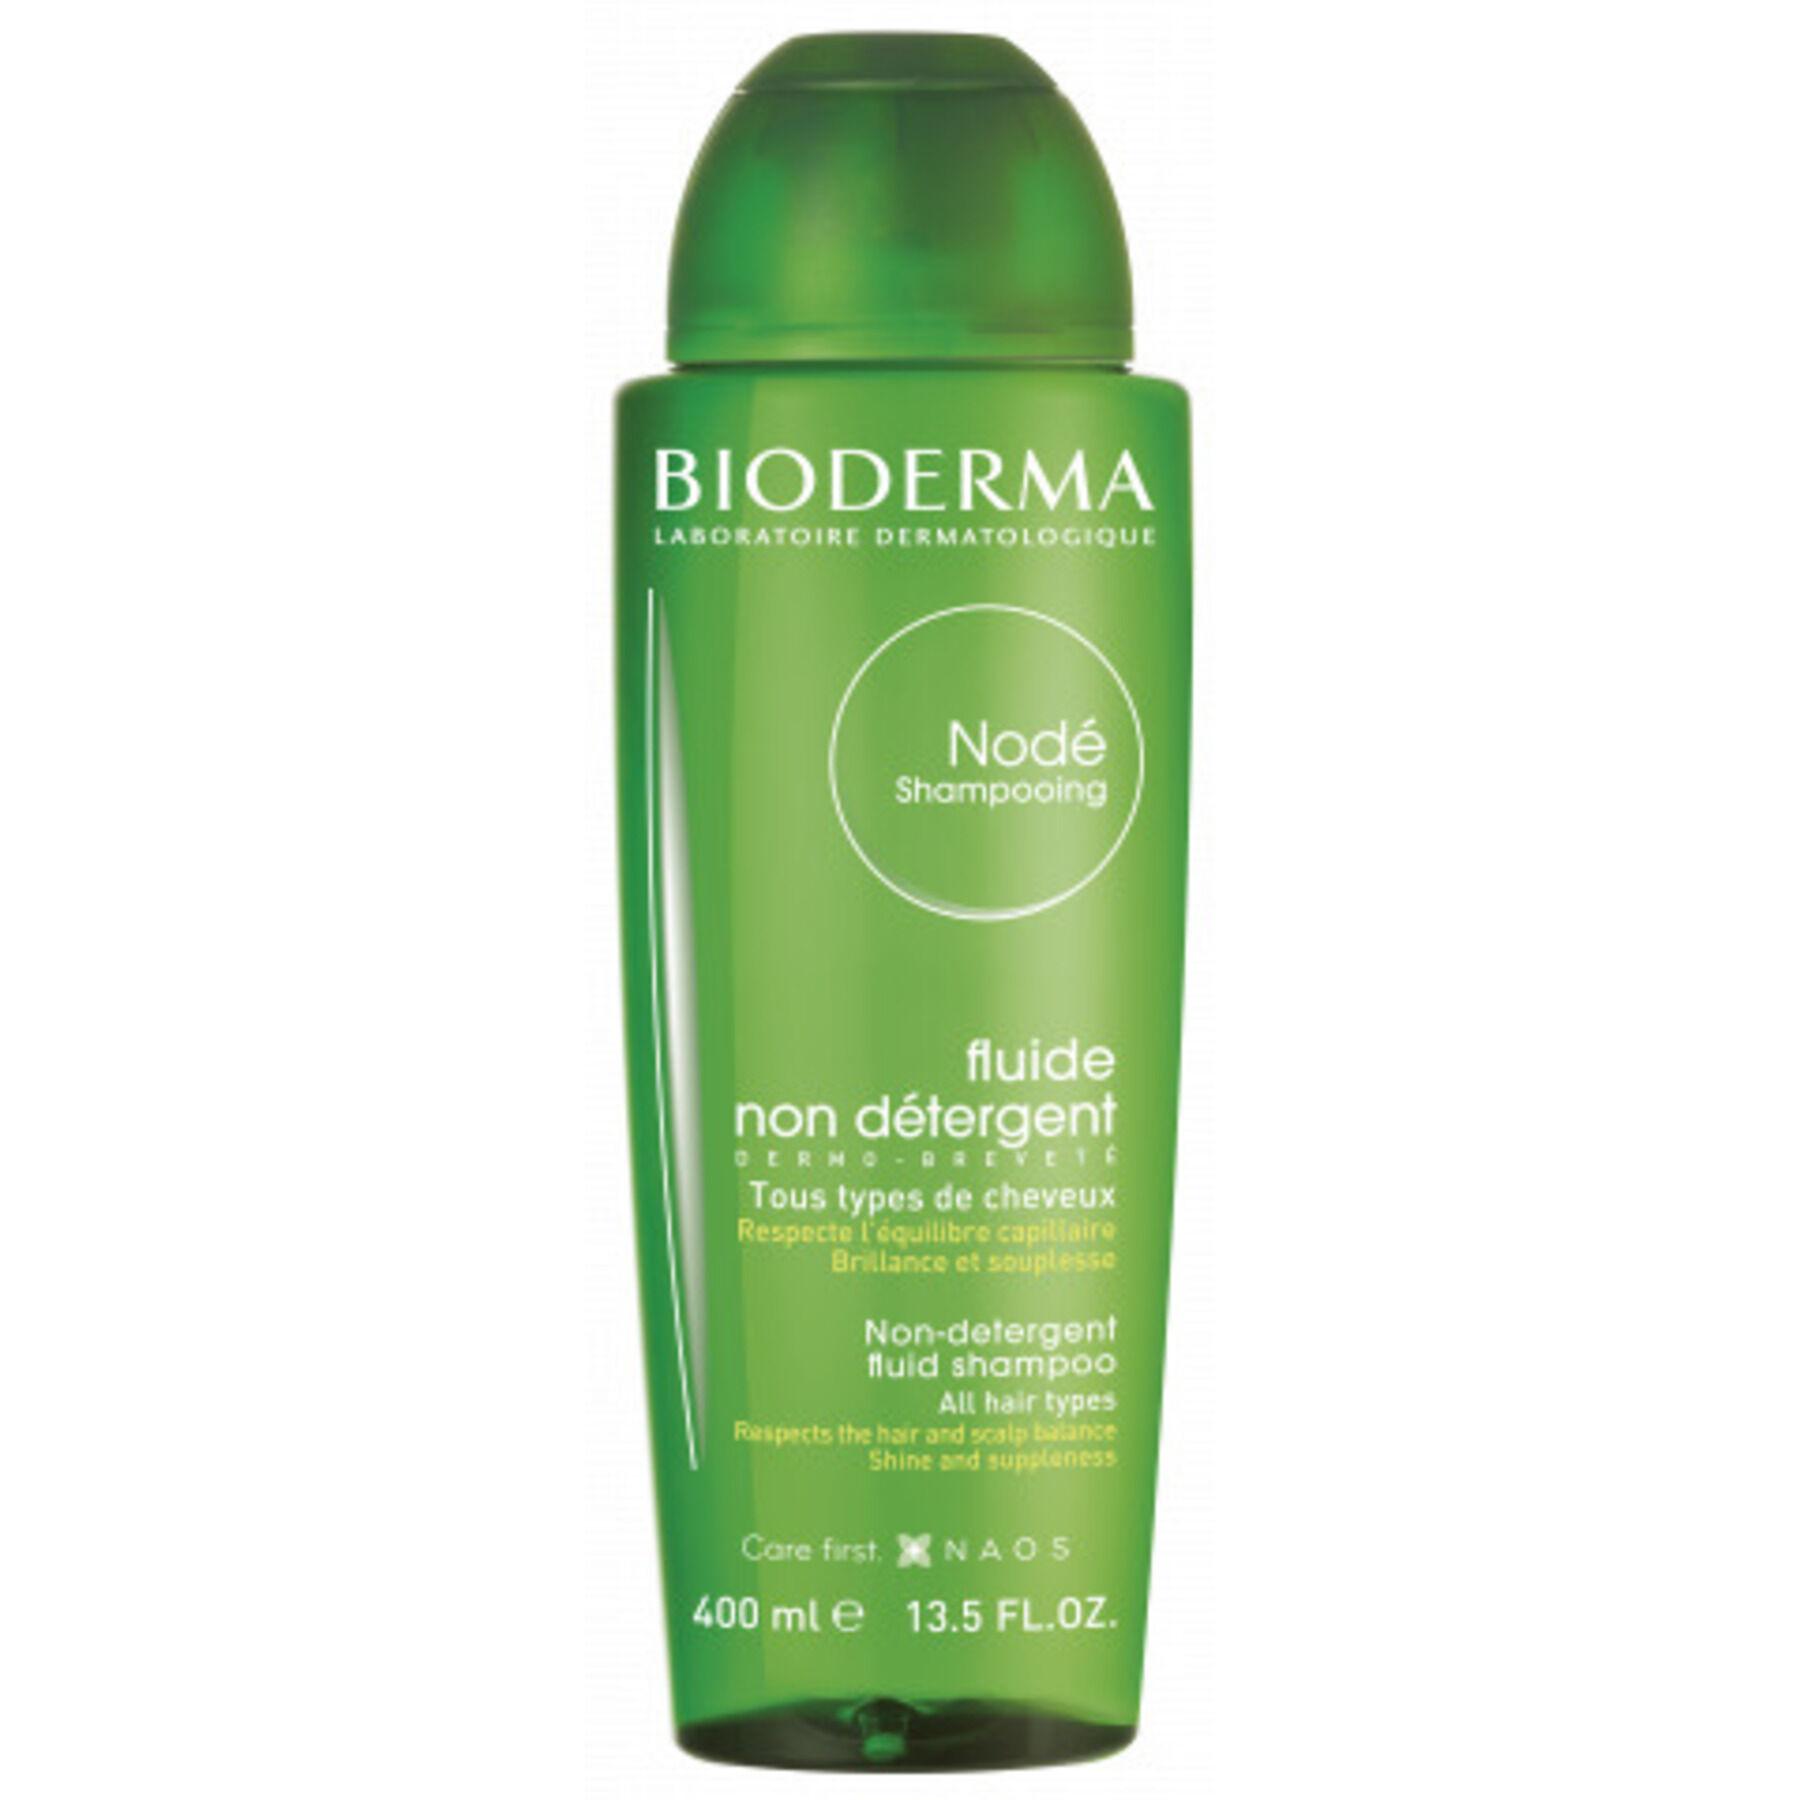 BIODERMA ITALIA Srl Node shampooing fluide non detergent 400 ml